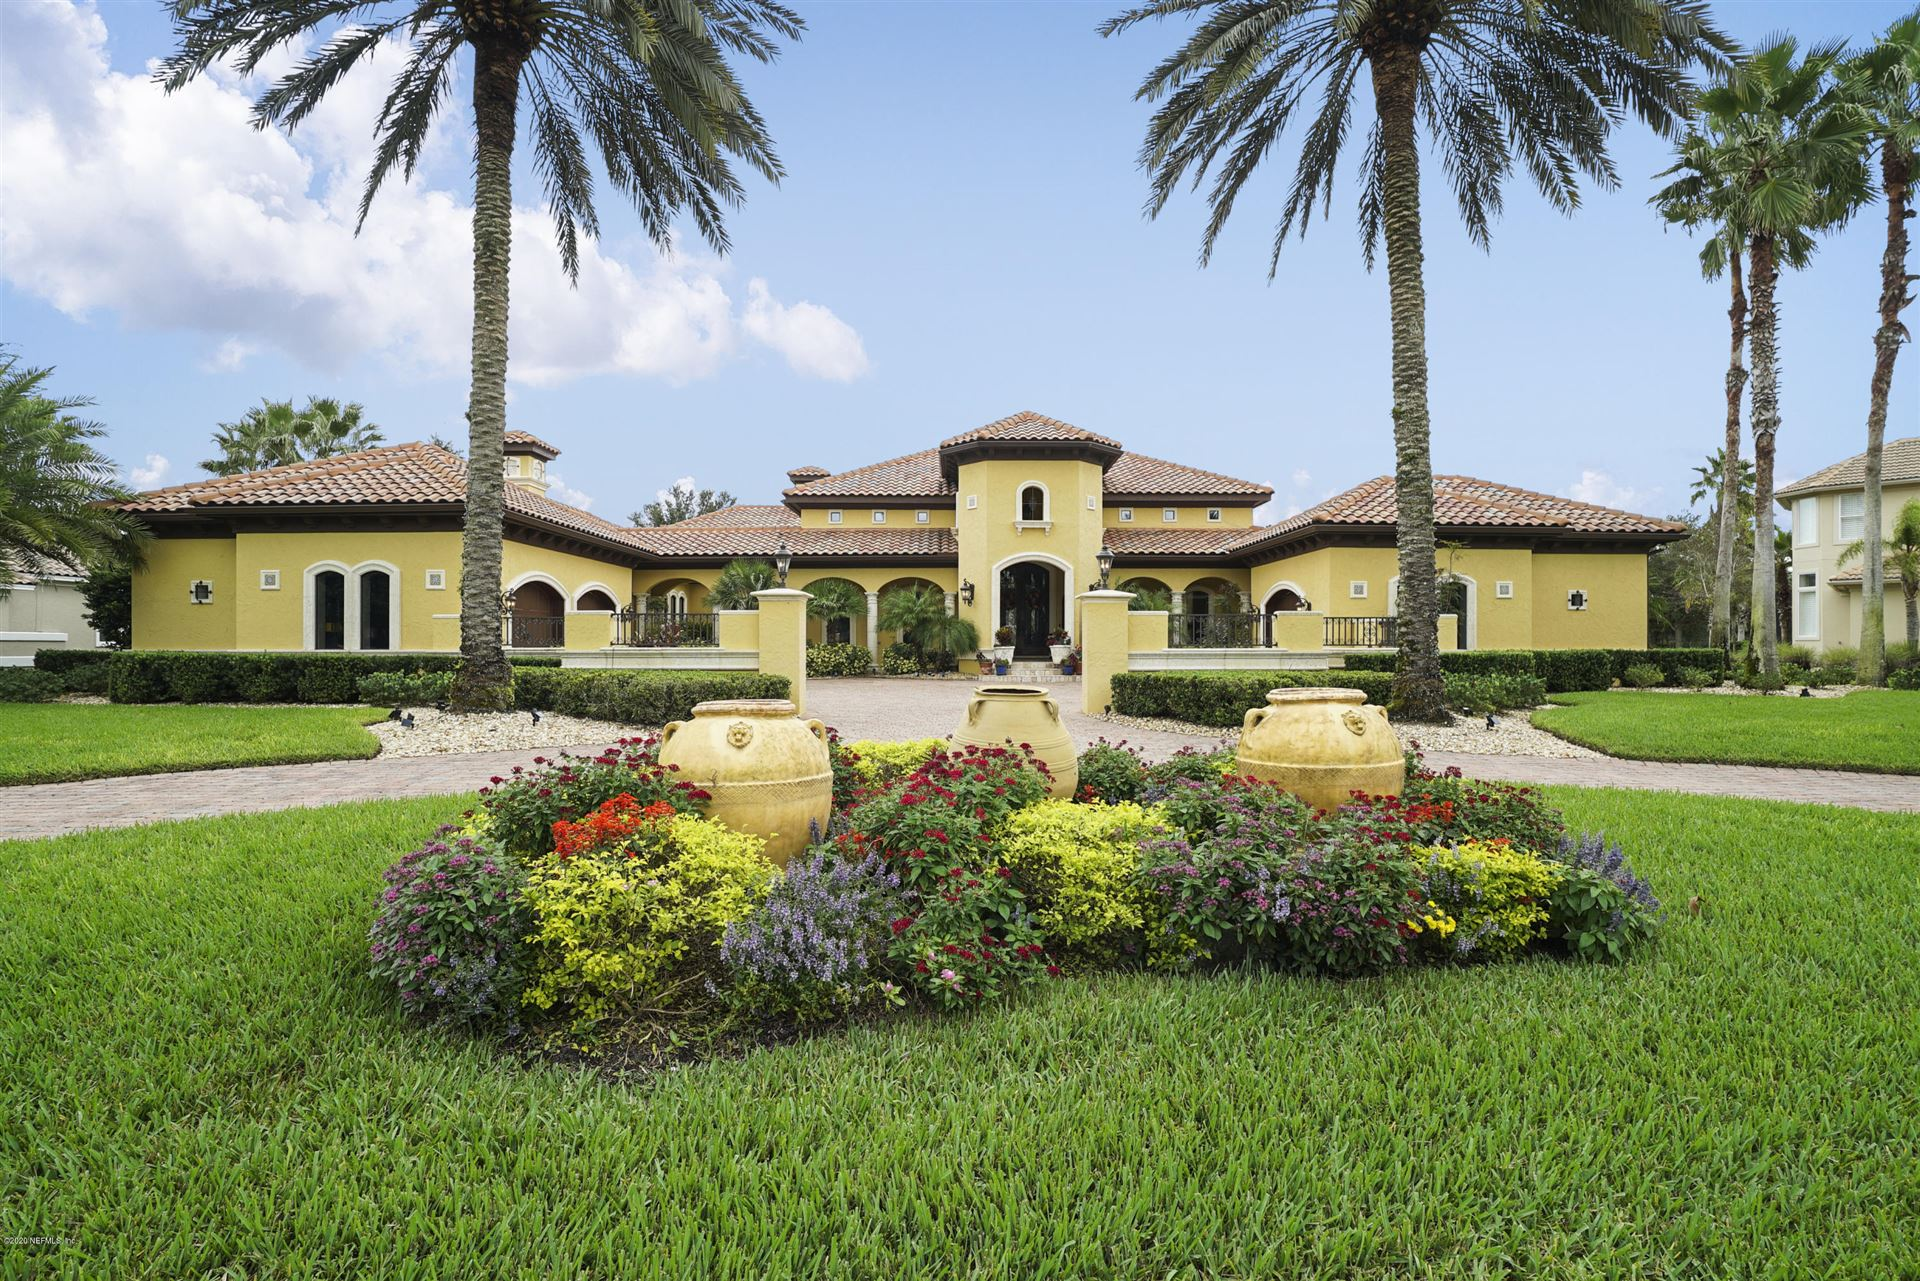 105 HICKORY HILL DR #Lot No: 29, Saint Augustine, FL 32095 - MLS#: 1075757